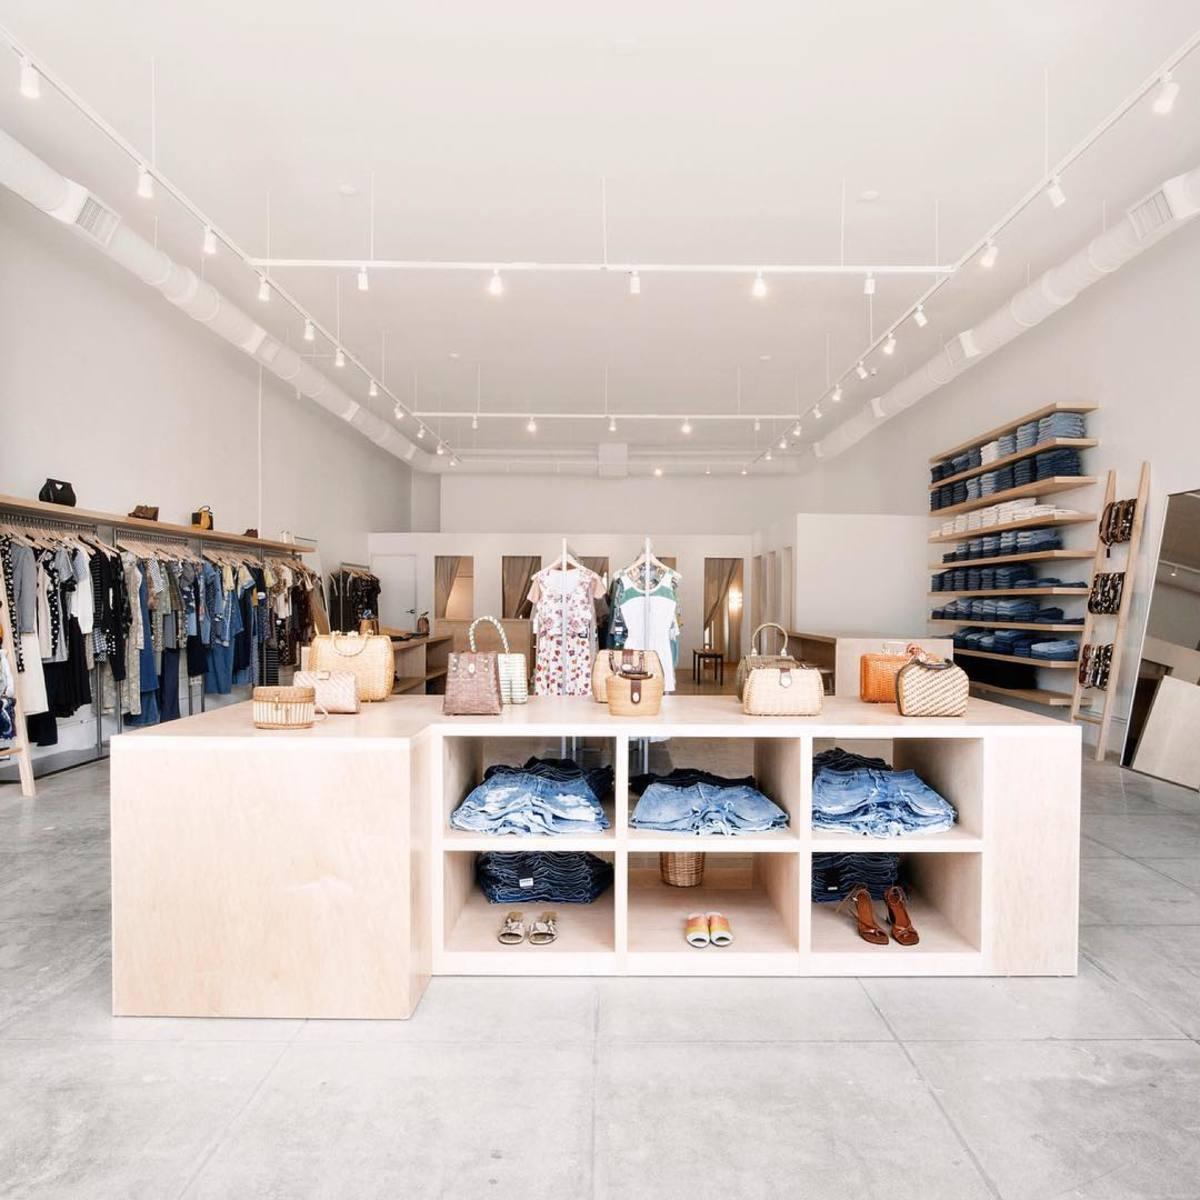 Reformation's Melrose Ave. vintage store. Photo: @reformation/Instagram